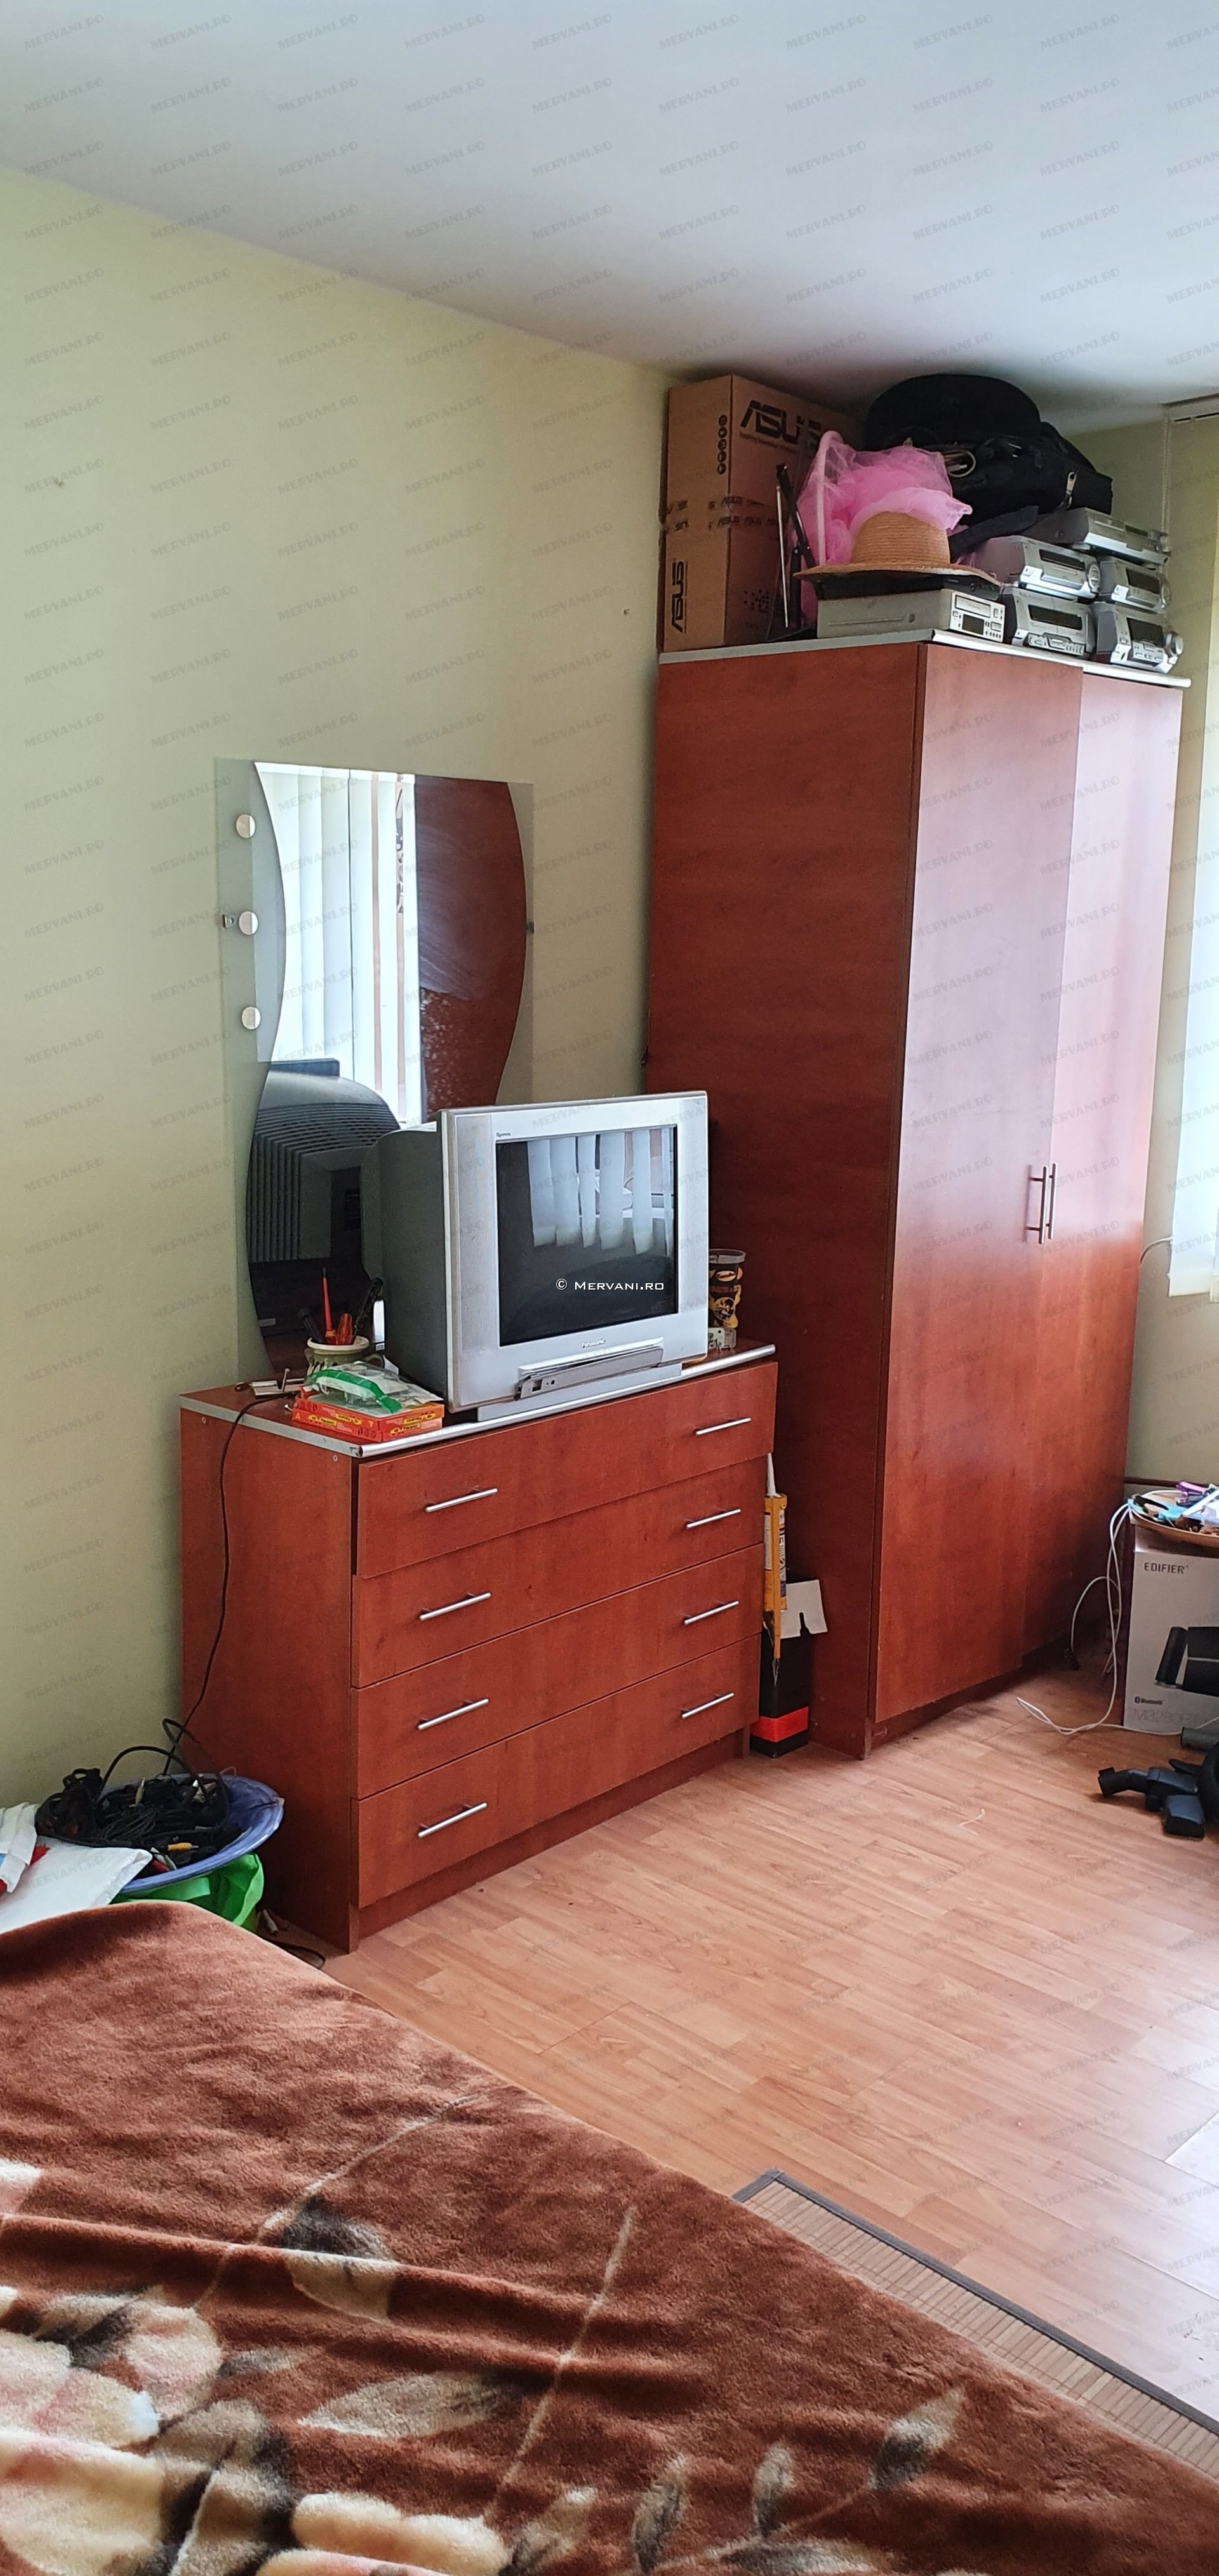 2053 – Vila cu 5 camere de Vanzare in Breaza, zona Semicentrala